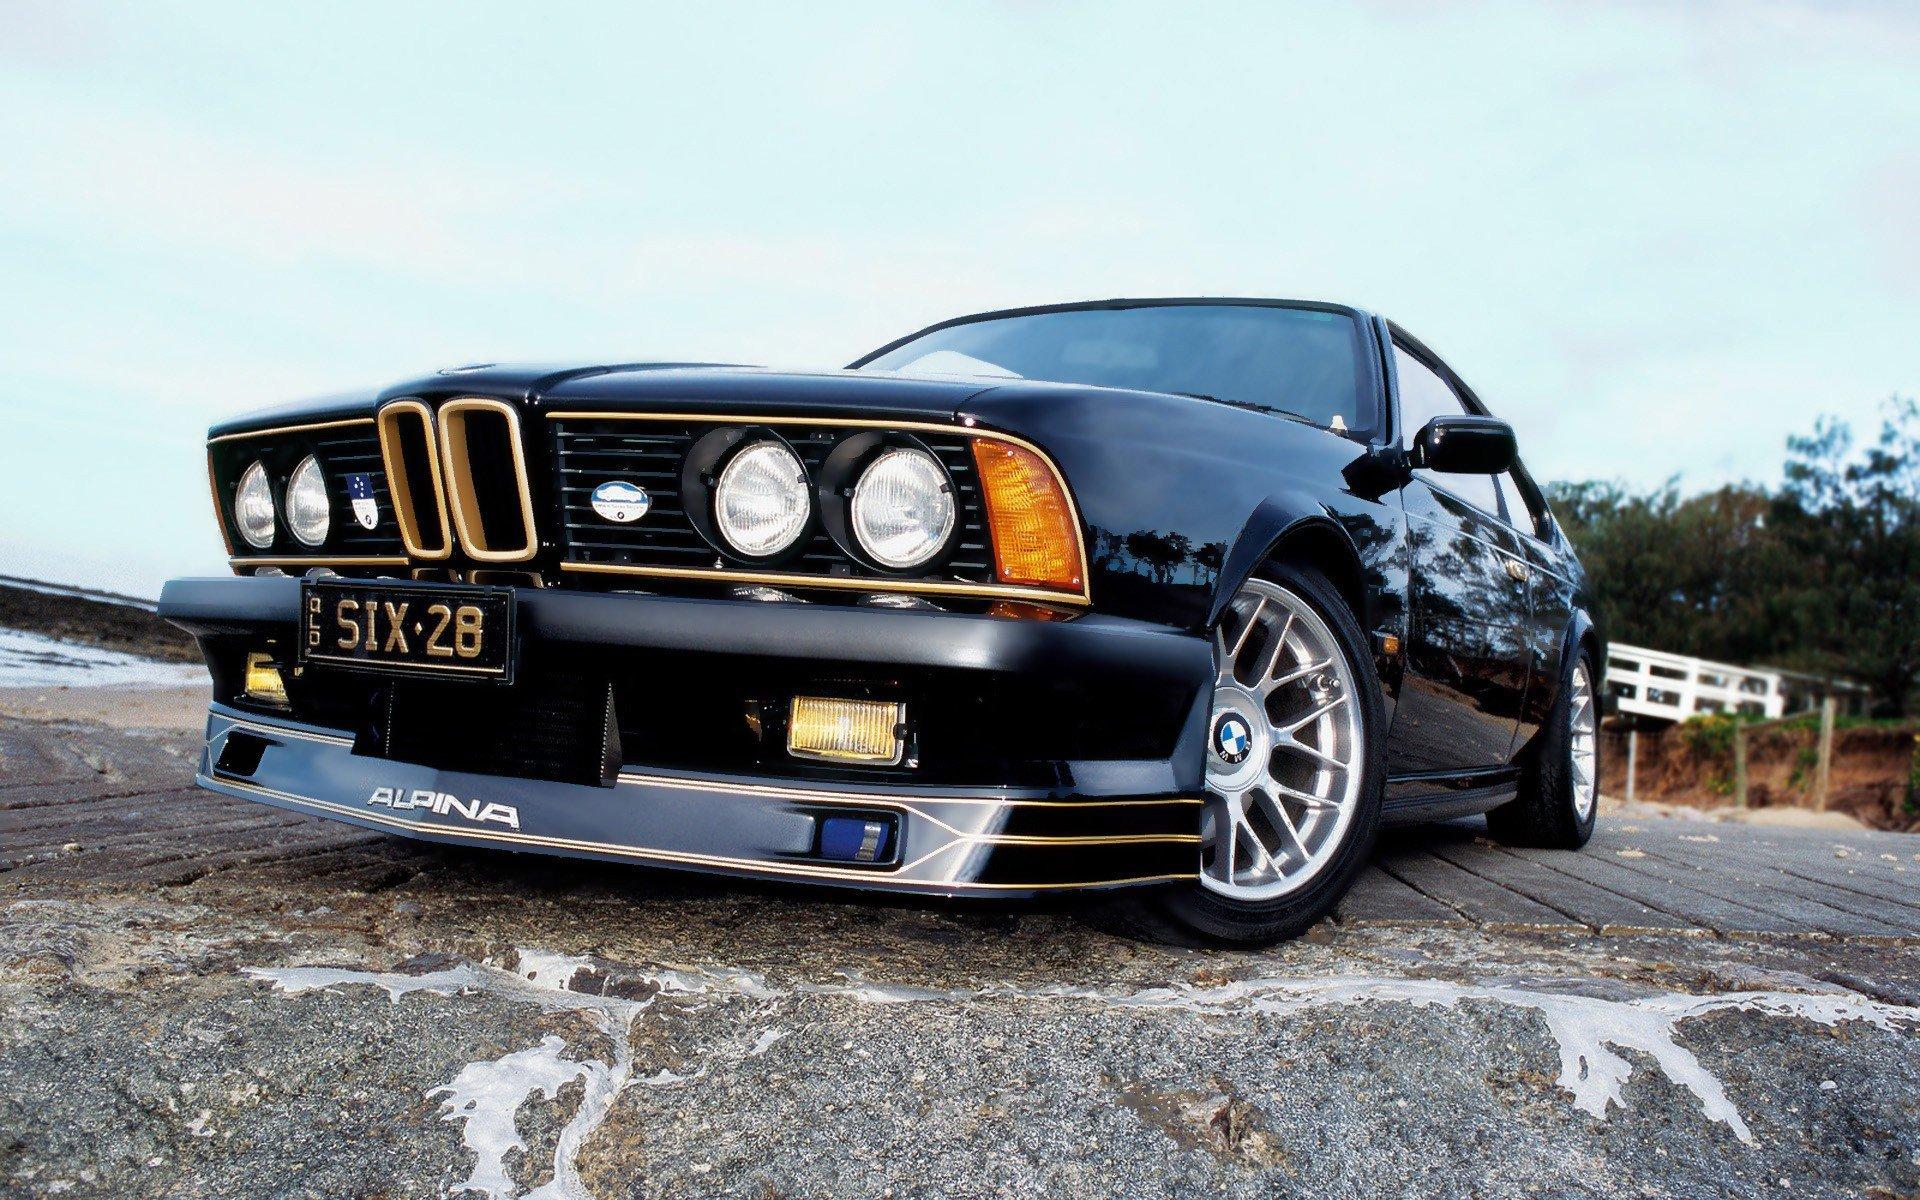 Bmw Cars Asphalt Reflections Alpina Low Angle Shot